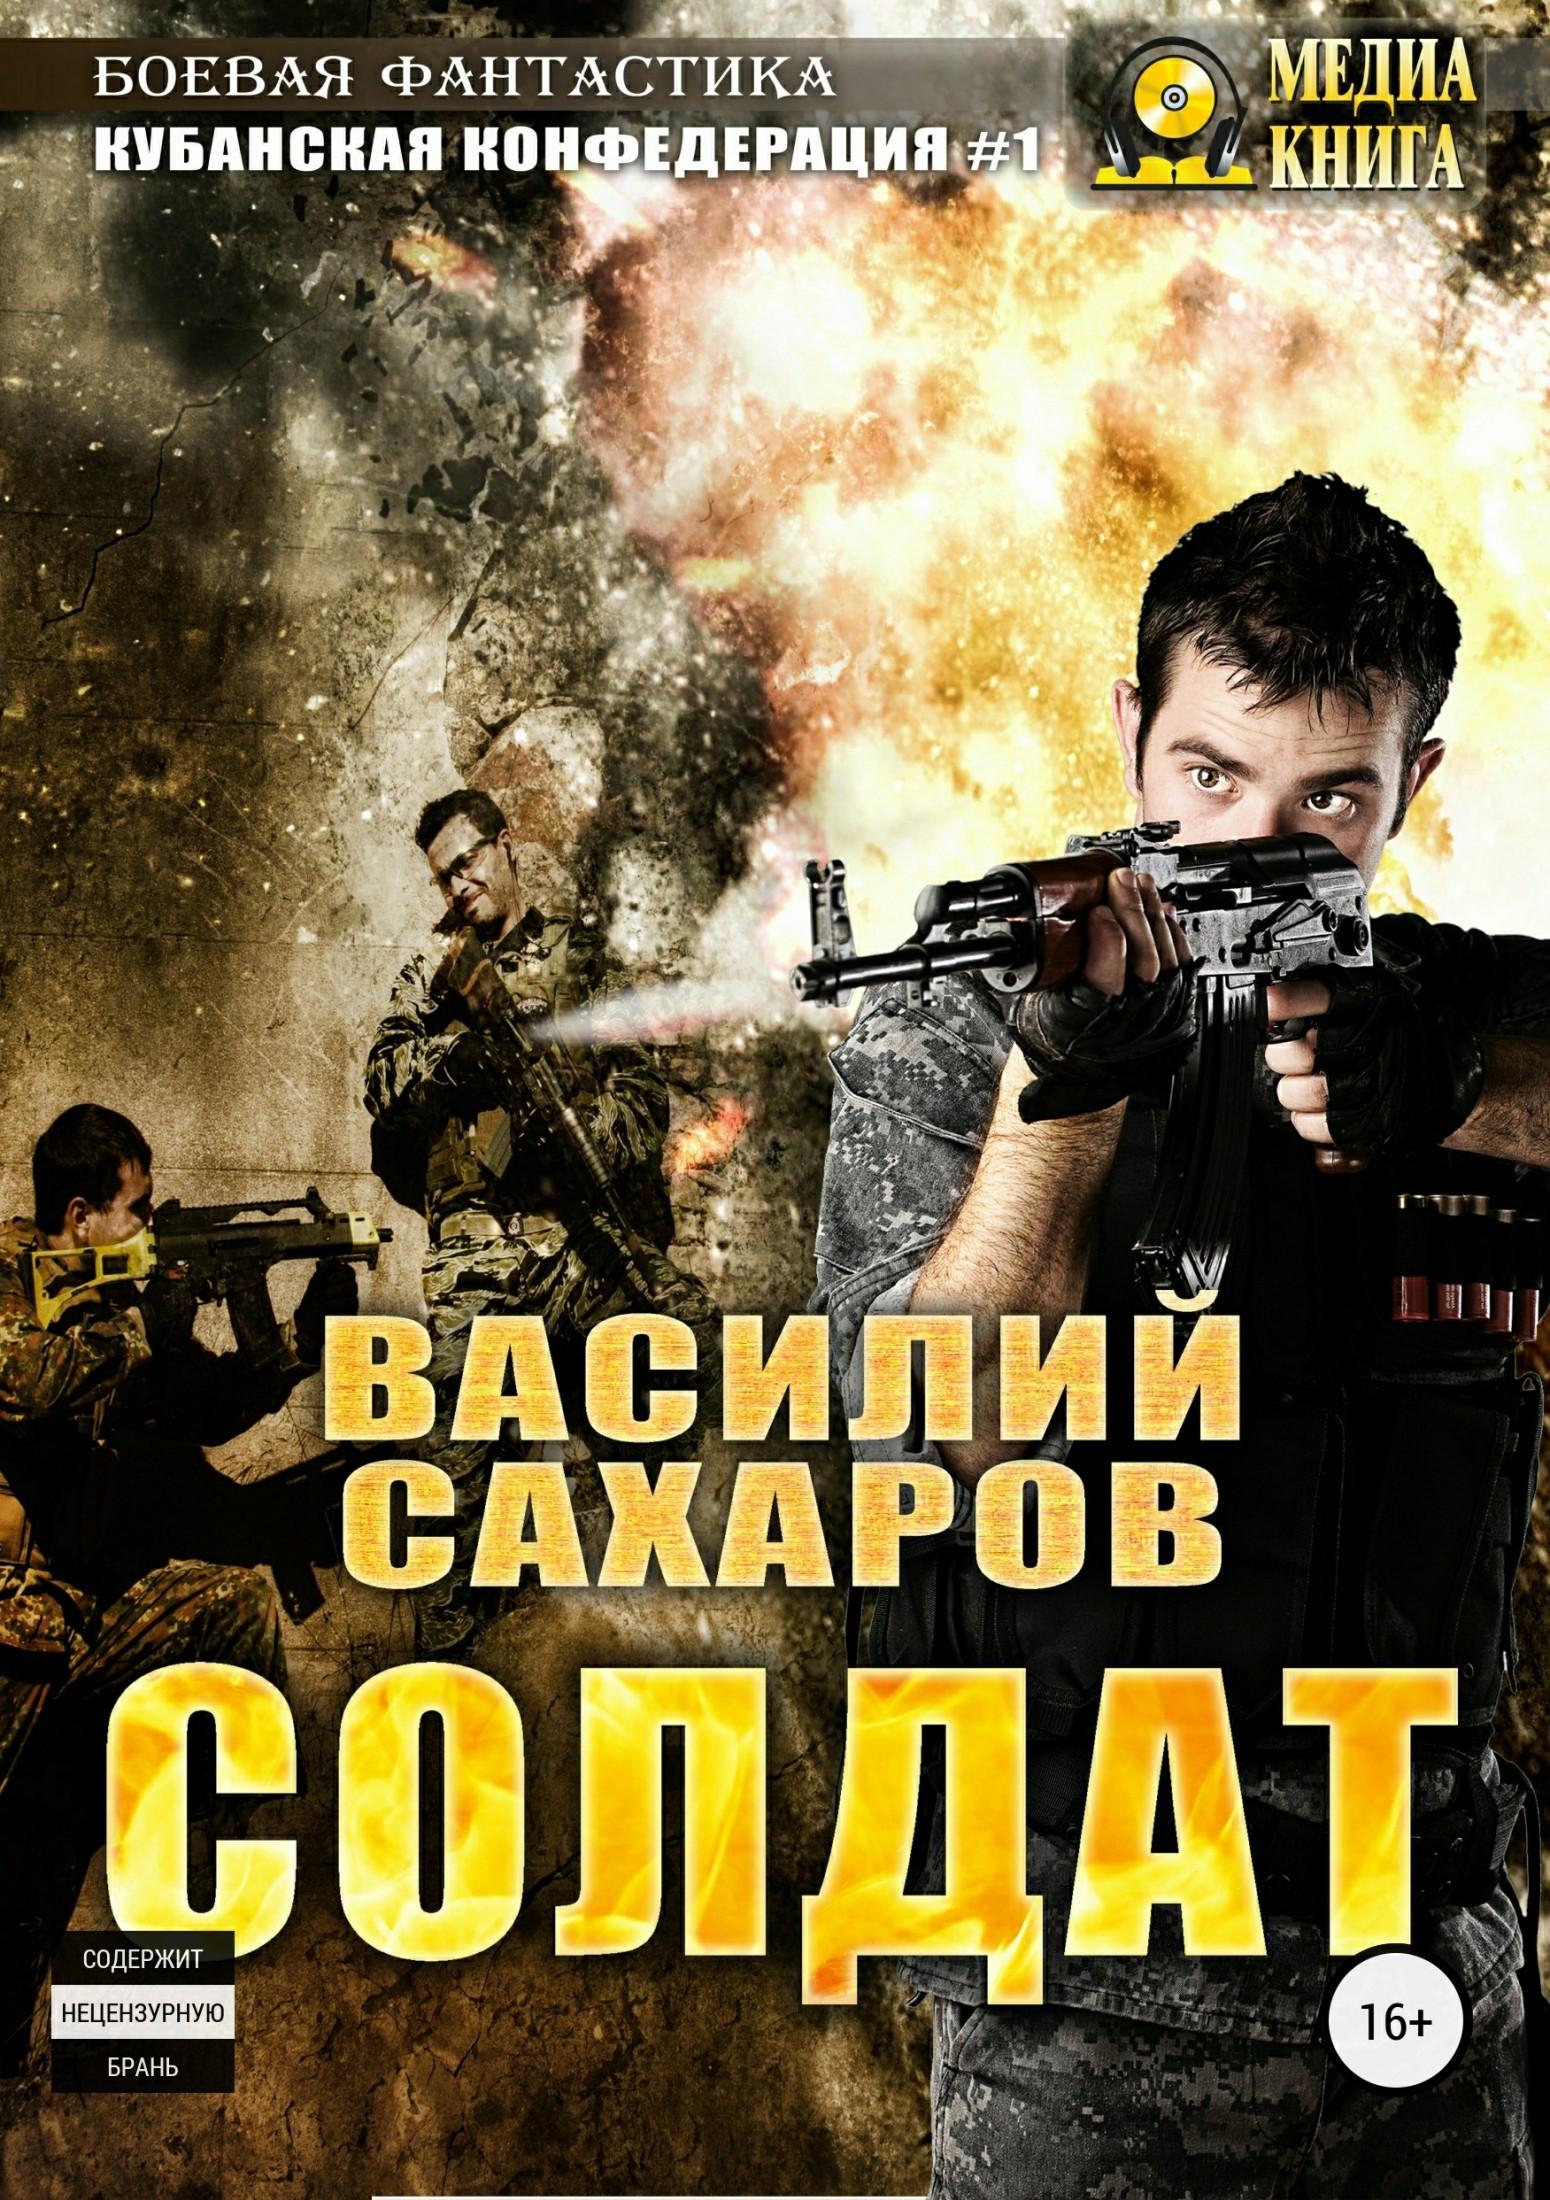 Василий Сахаров - Солдат